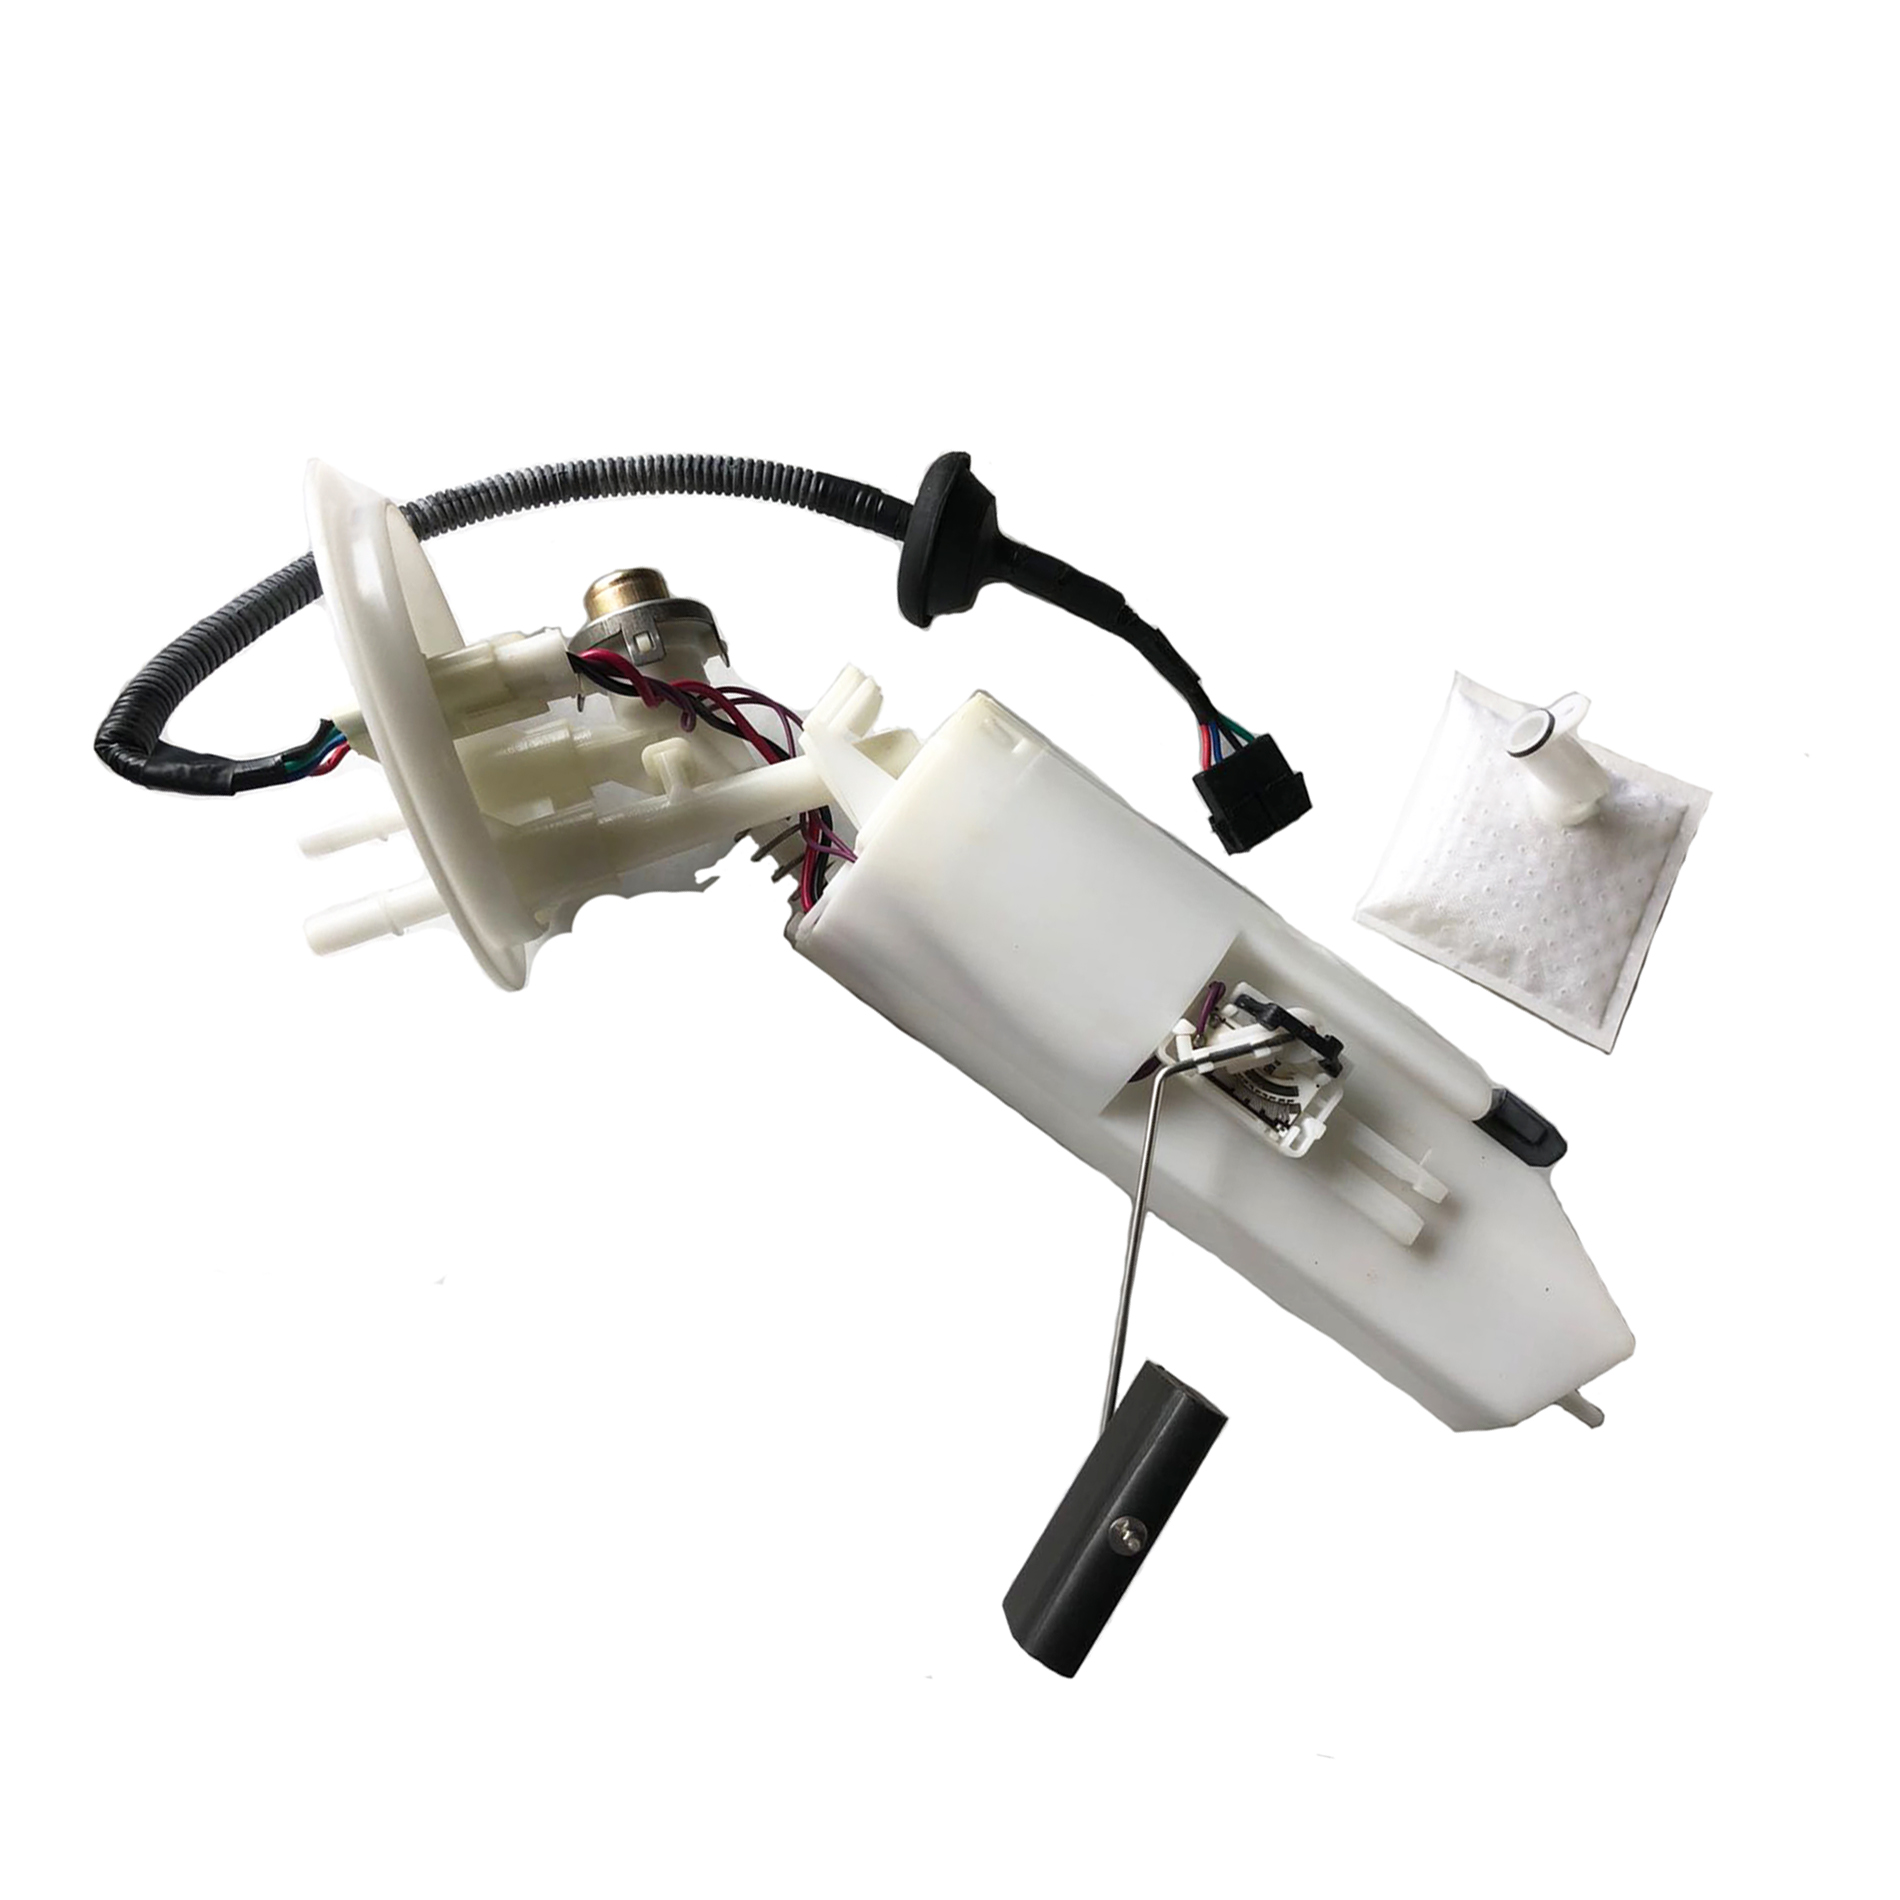 NEW 170778 12 Volt Fenwal Gas Valve Single Solenoid Model